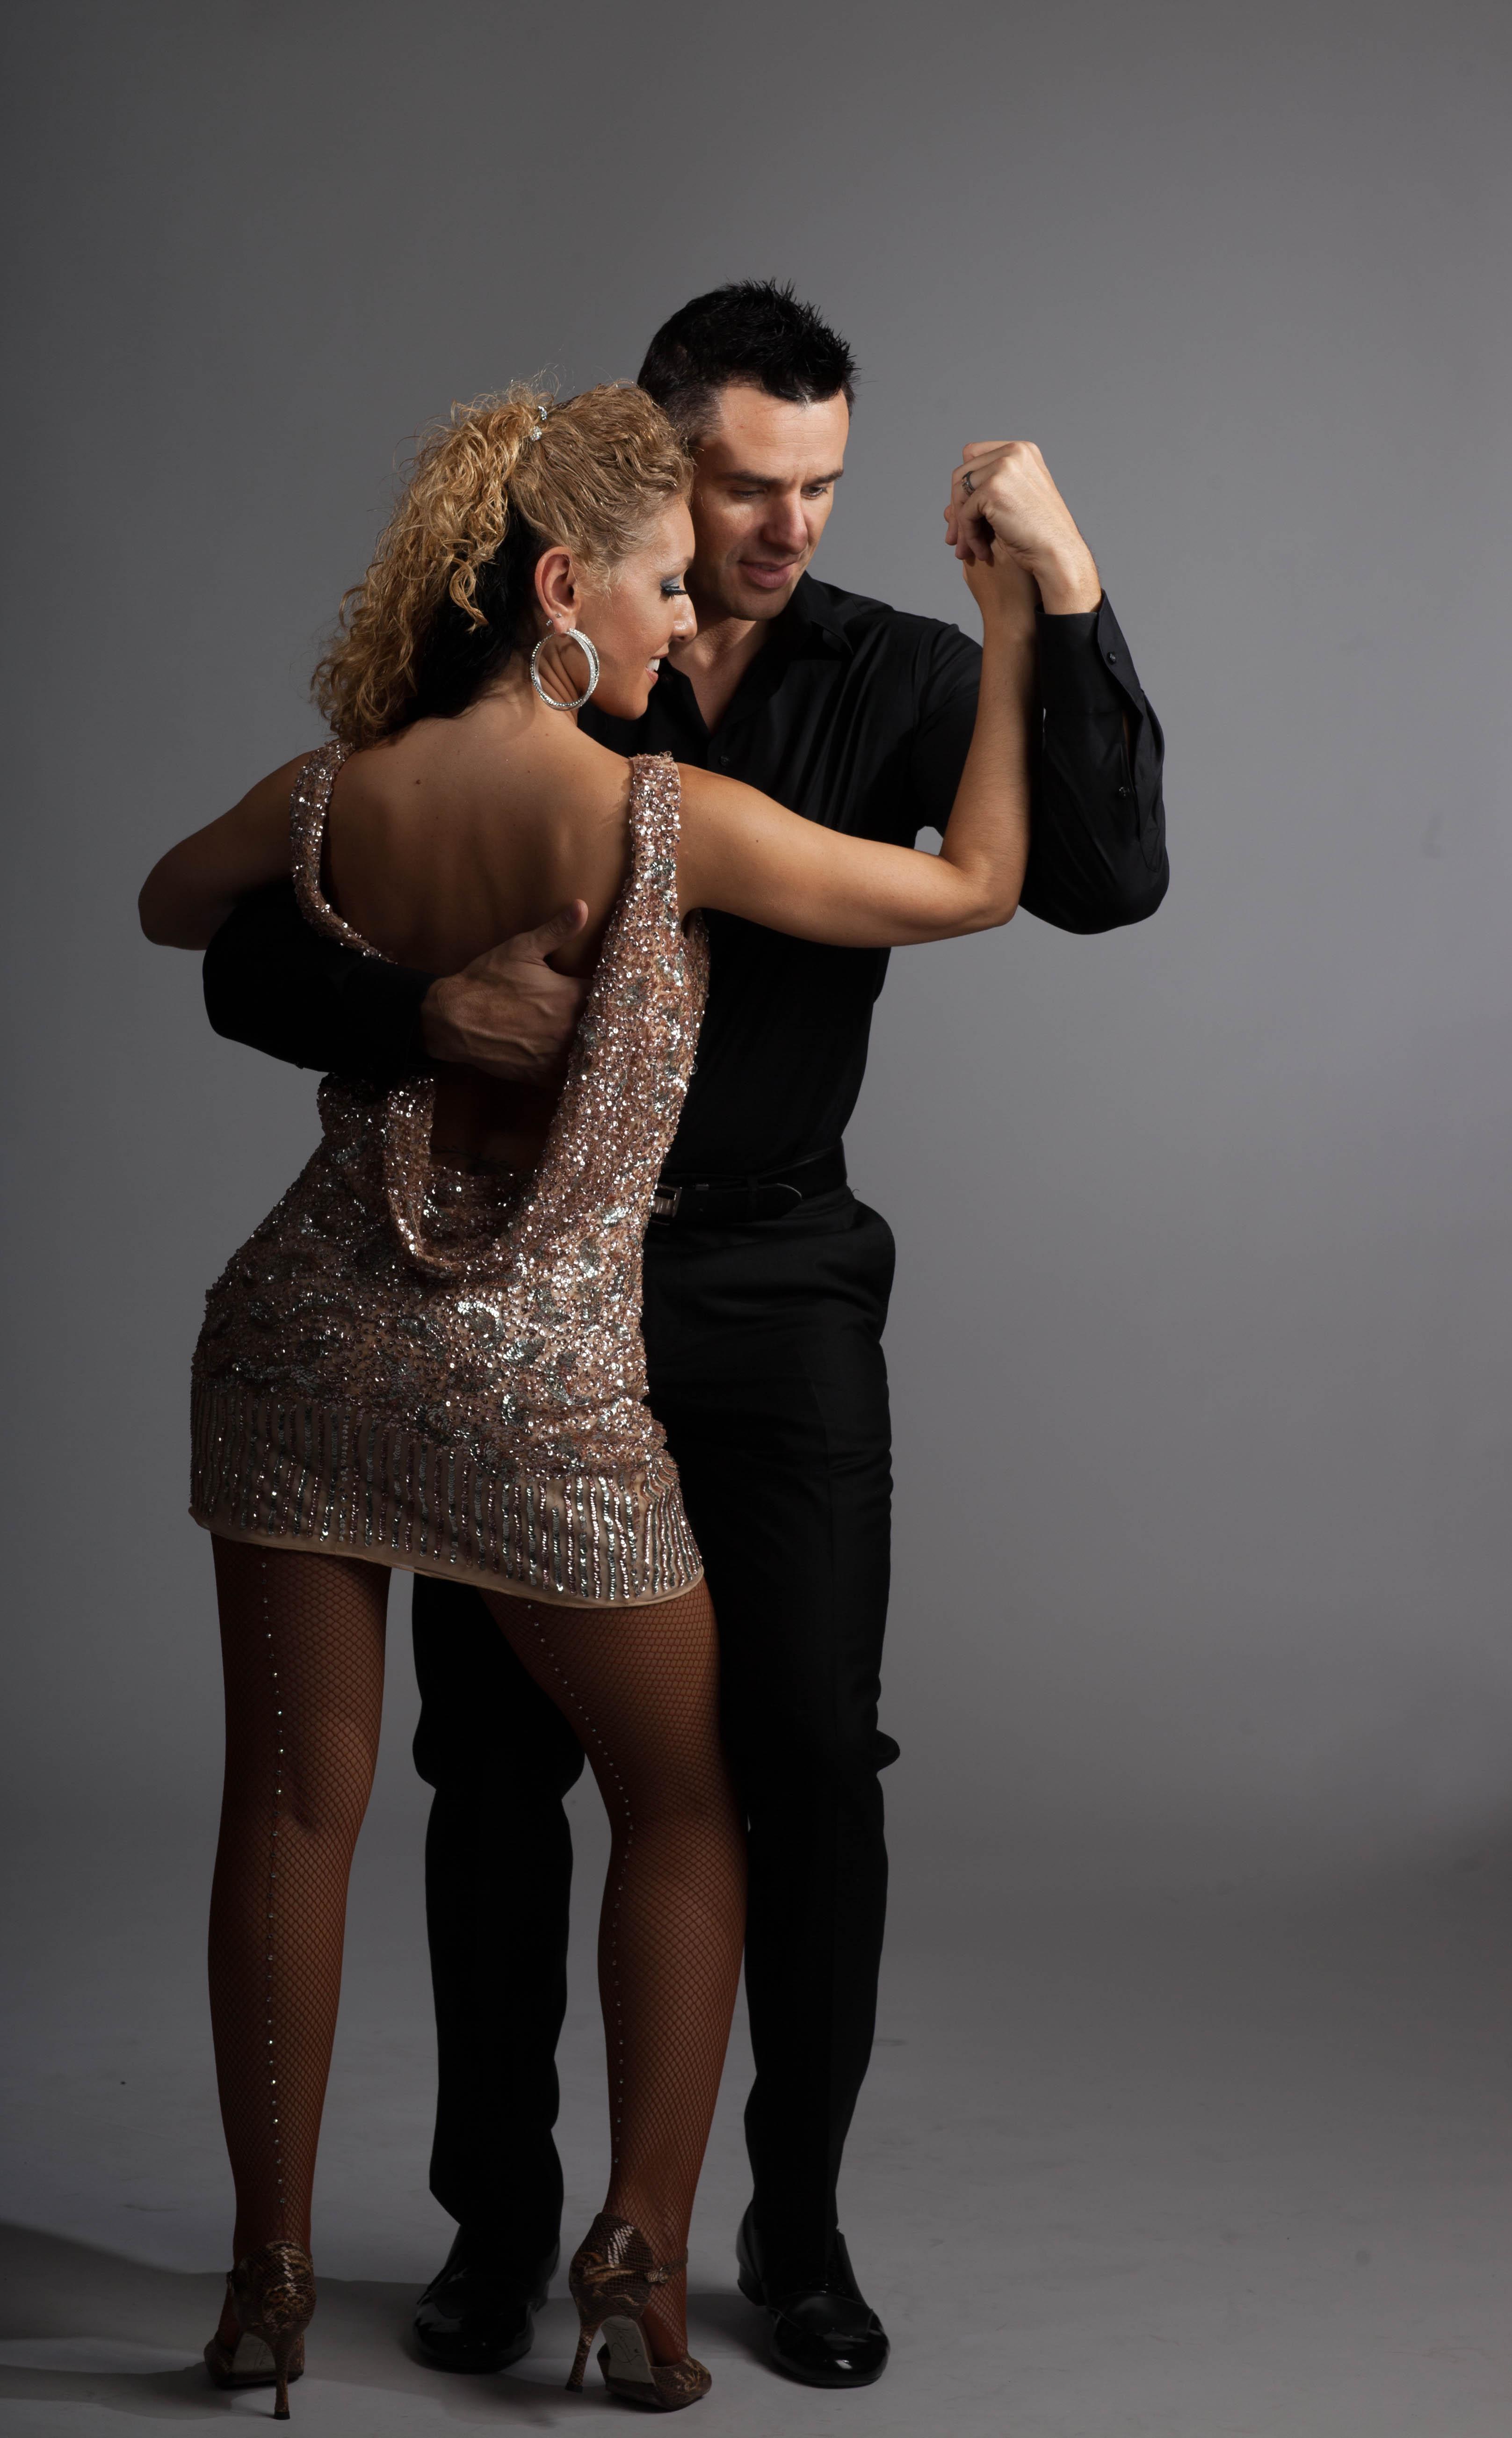 Toronto Salsa Bachata Dance Videos | Best Salsa/Bachata